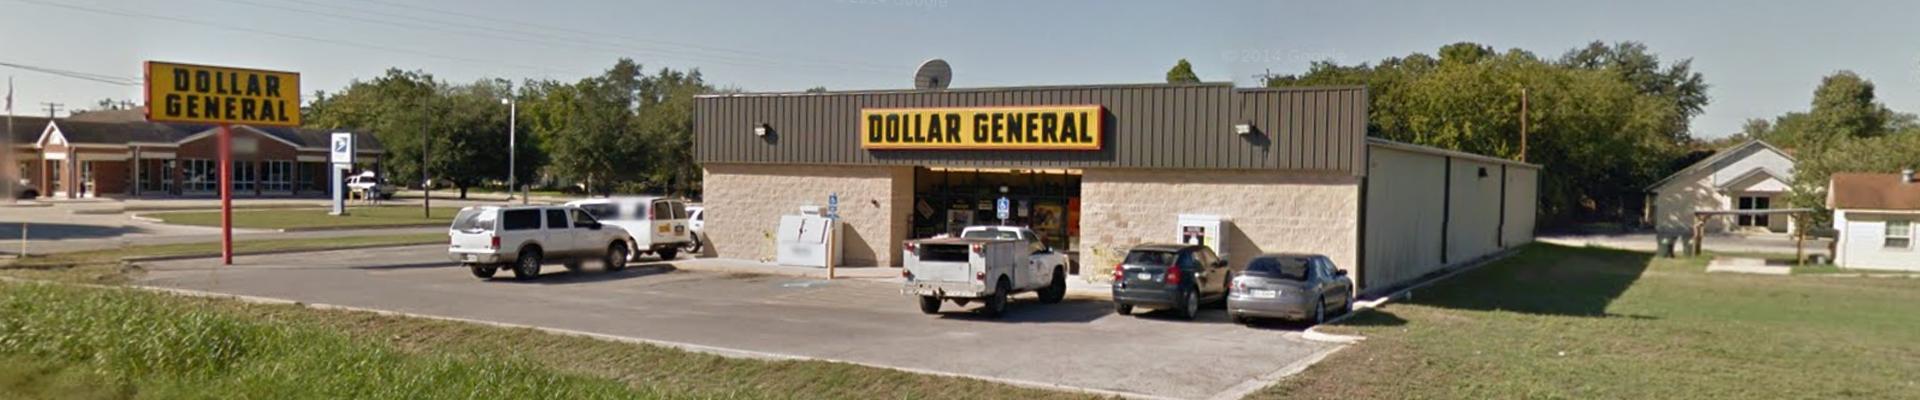 Dollar General (7426) – Stockdale, Texas